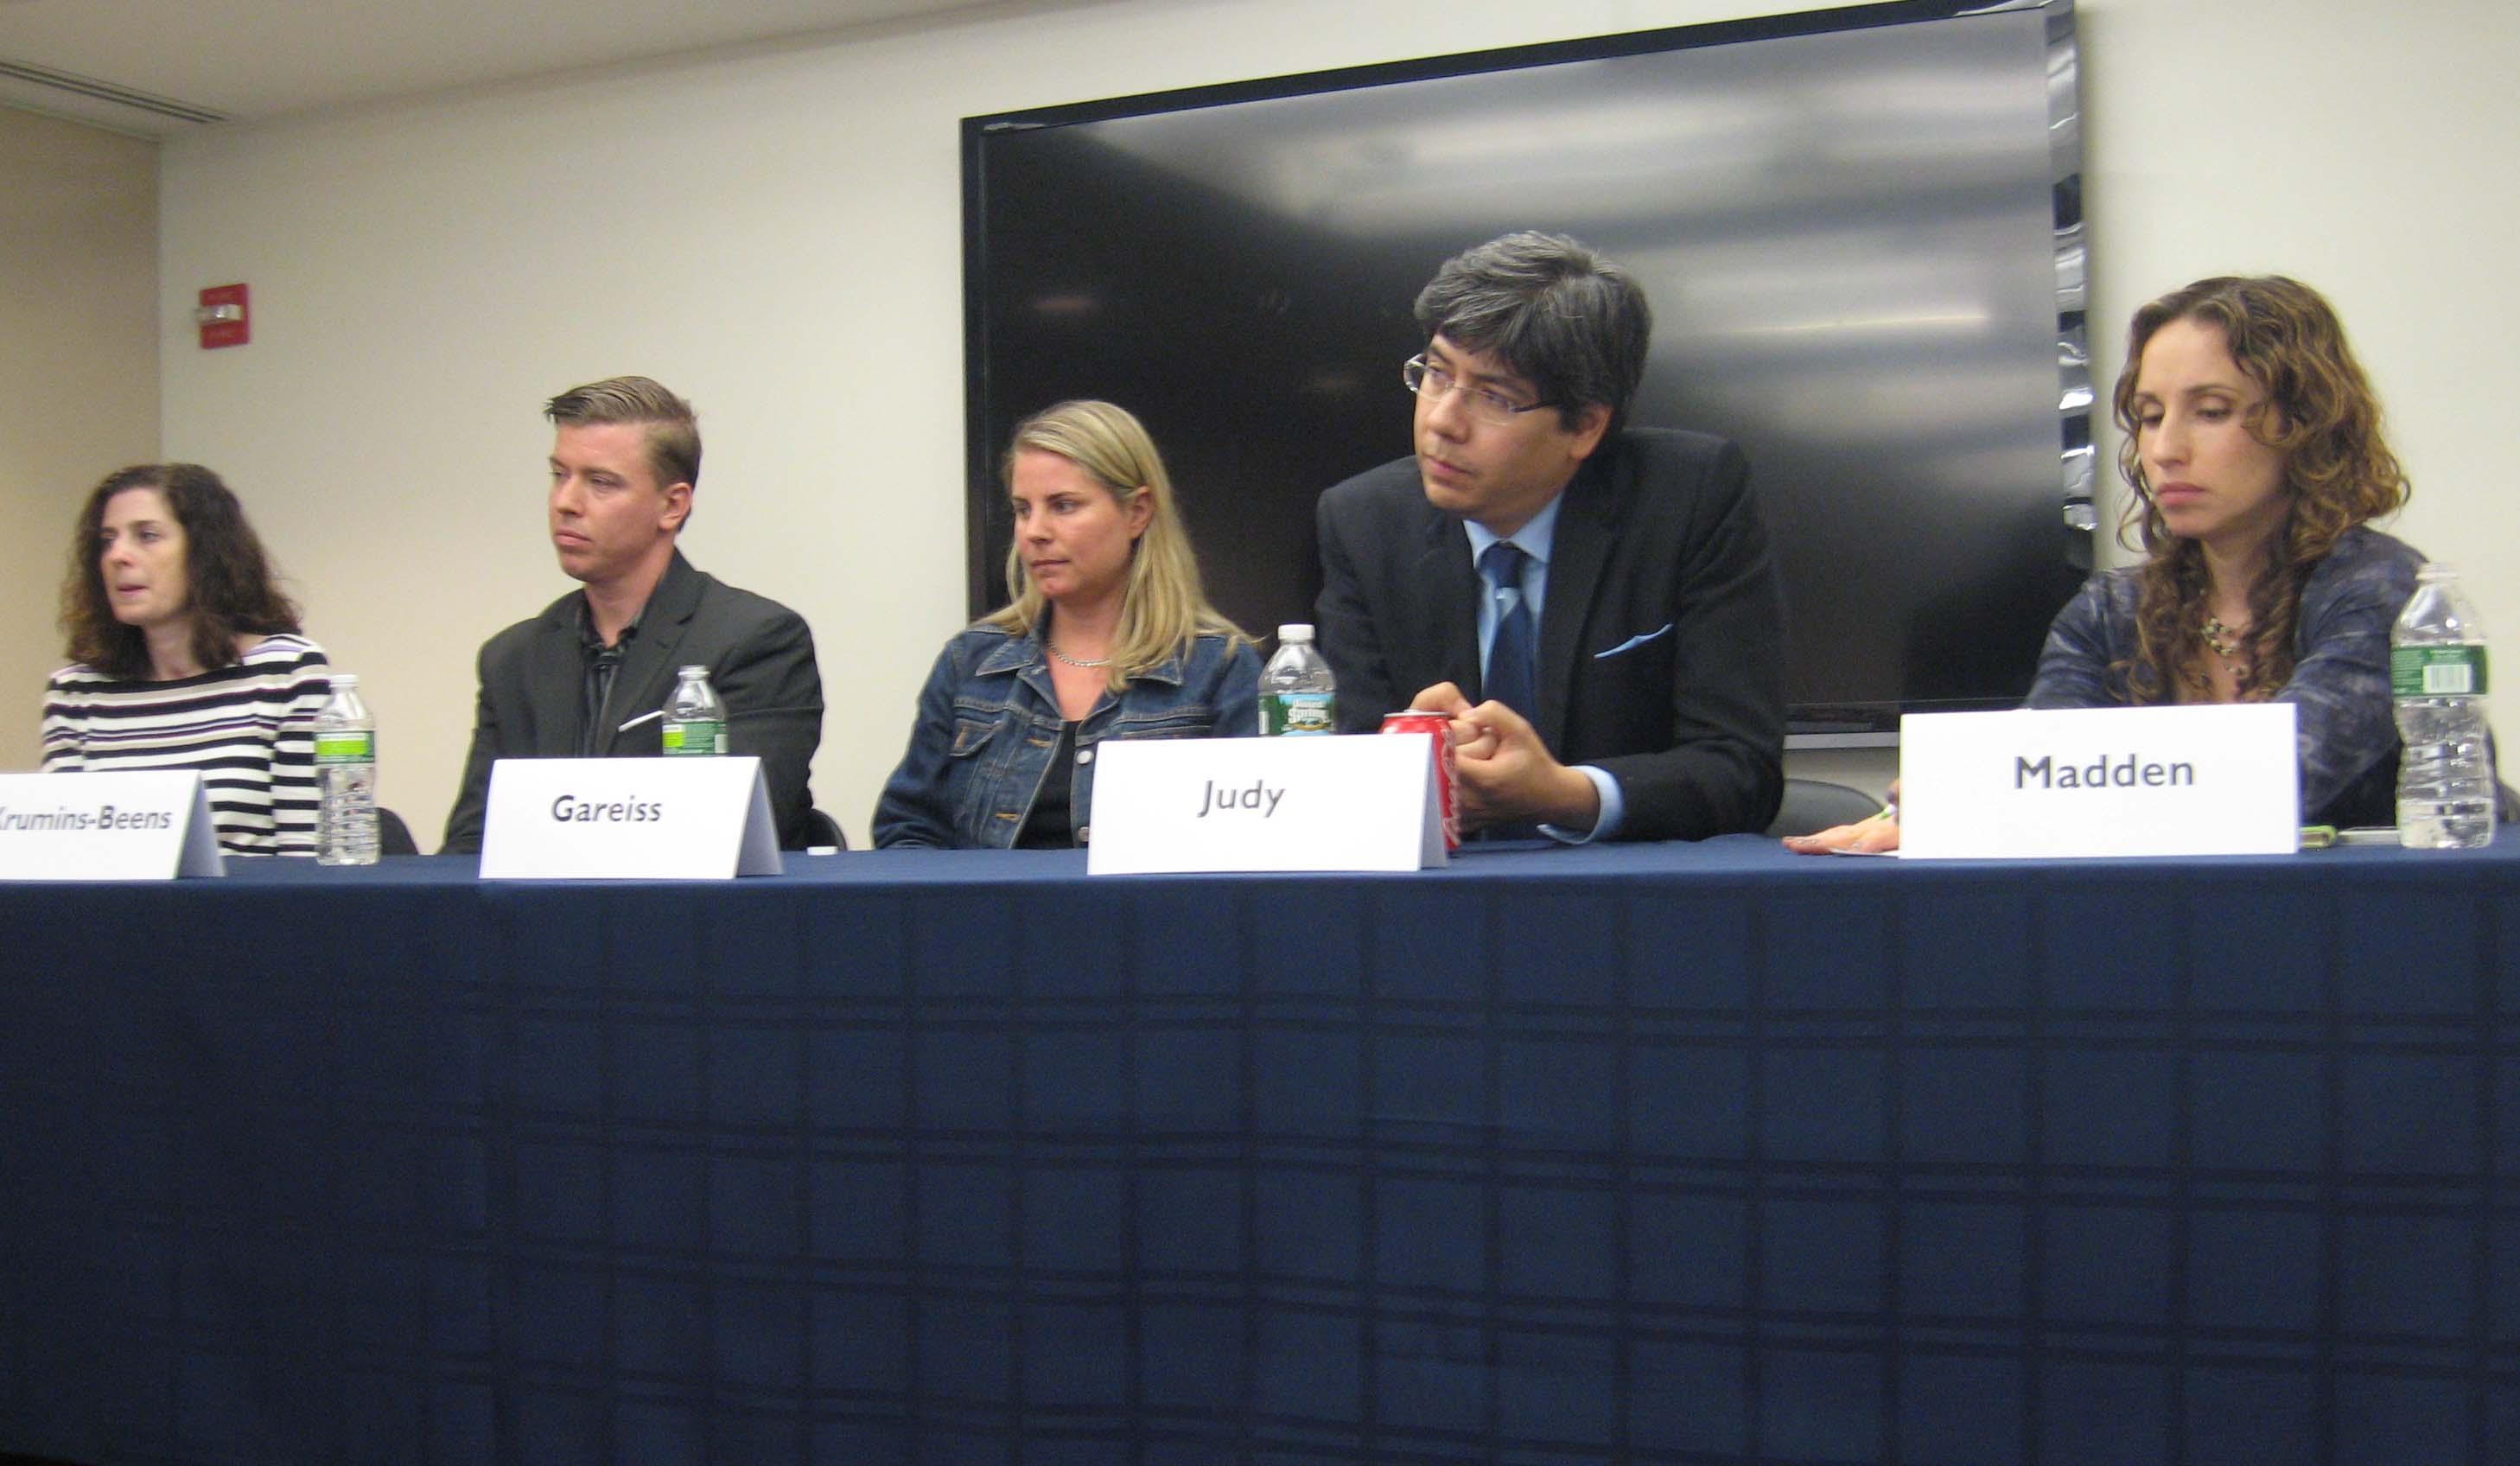 NY Intrapreneur's panel of speakers